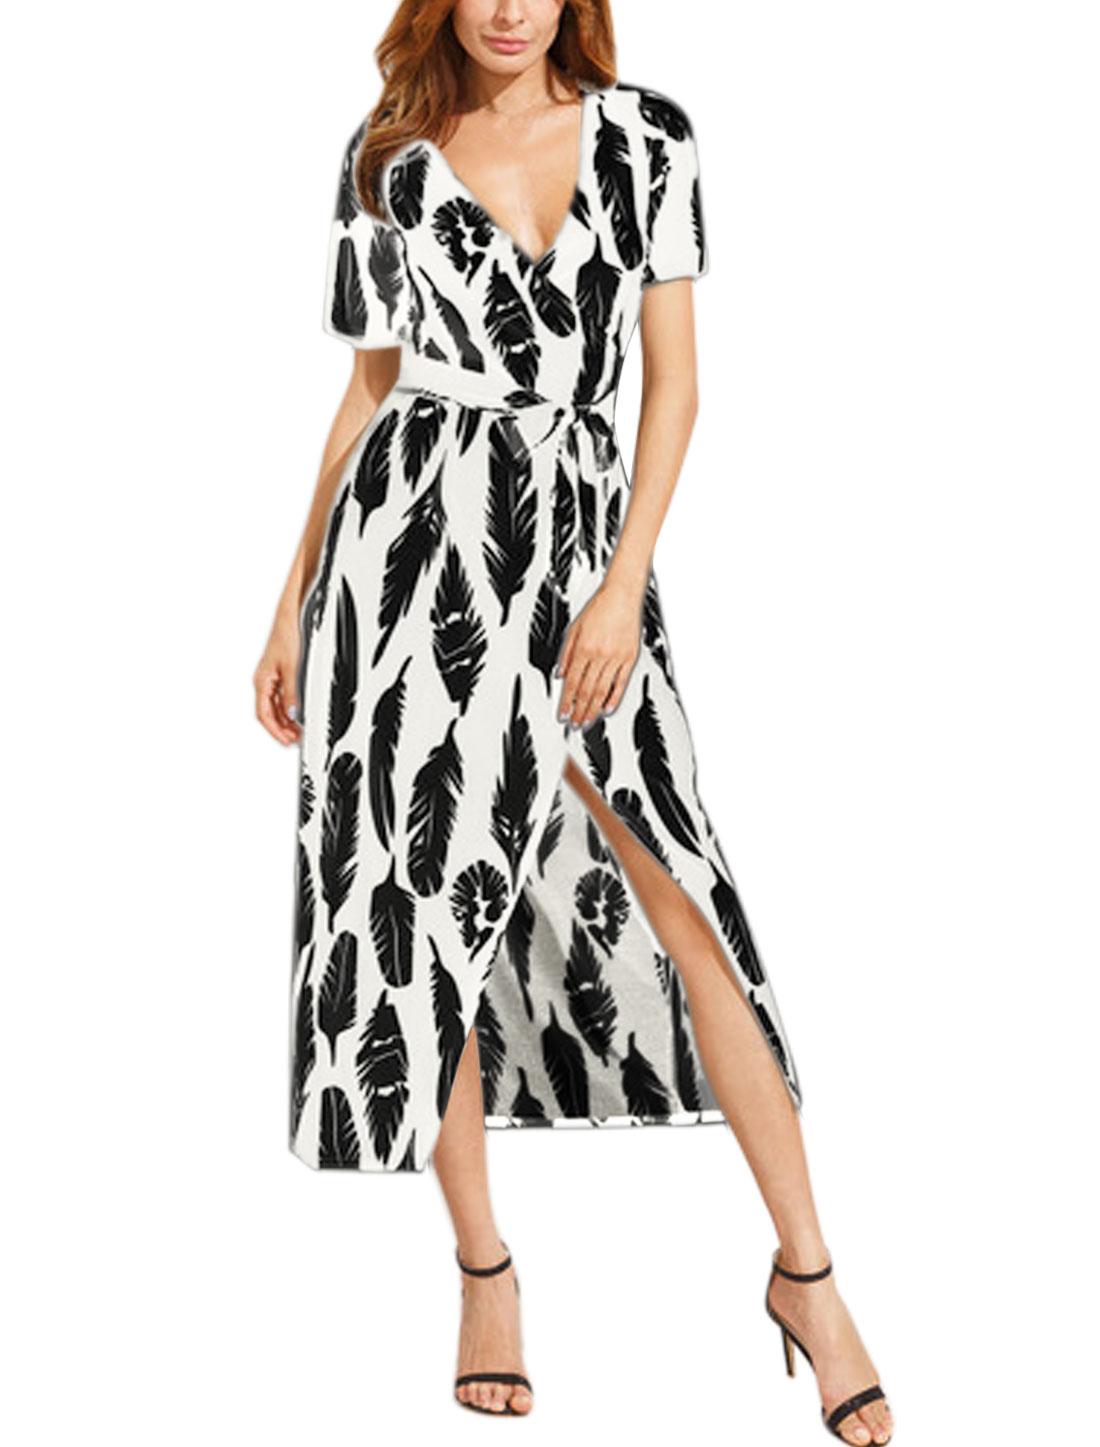 Women Crossover V Neck Feather Prints Midi Wrap Dress w Belt White Black L